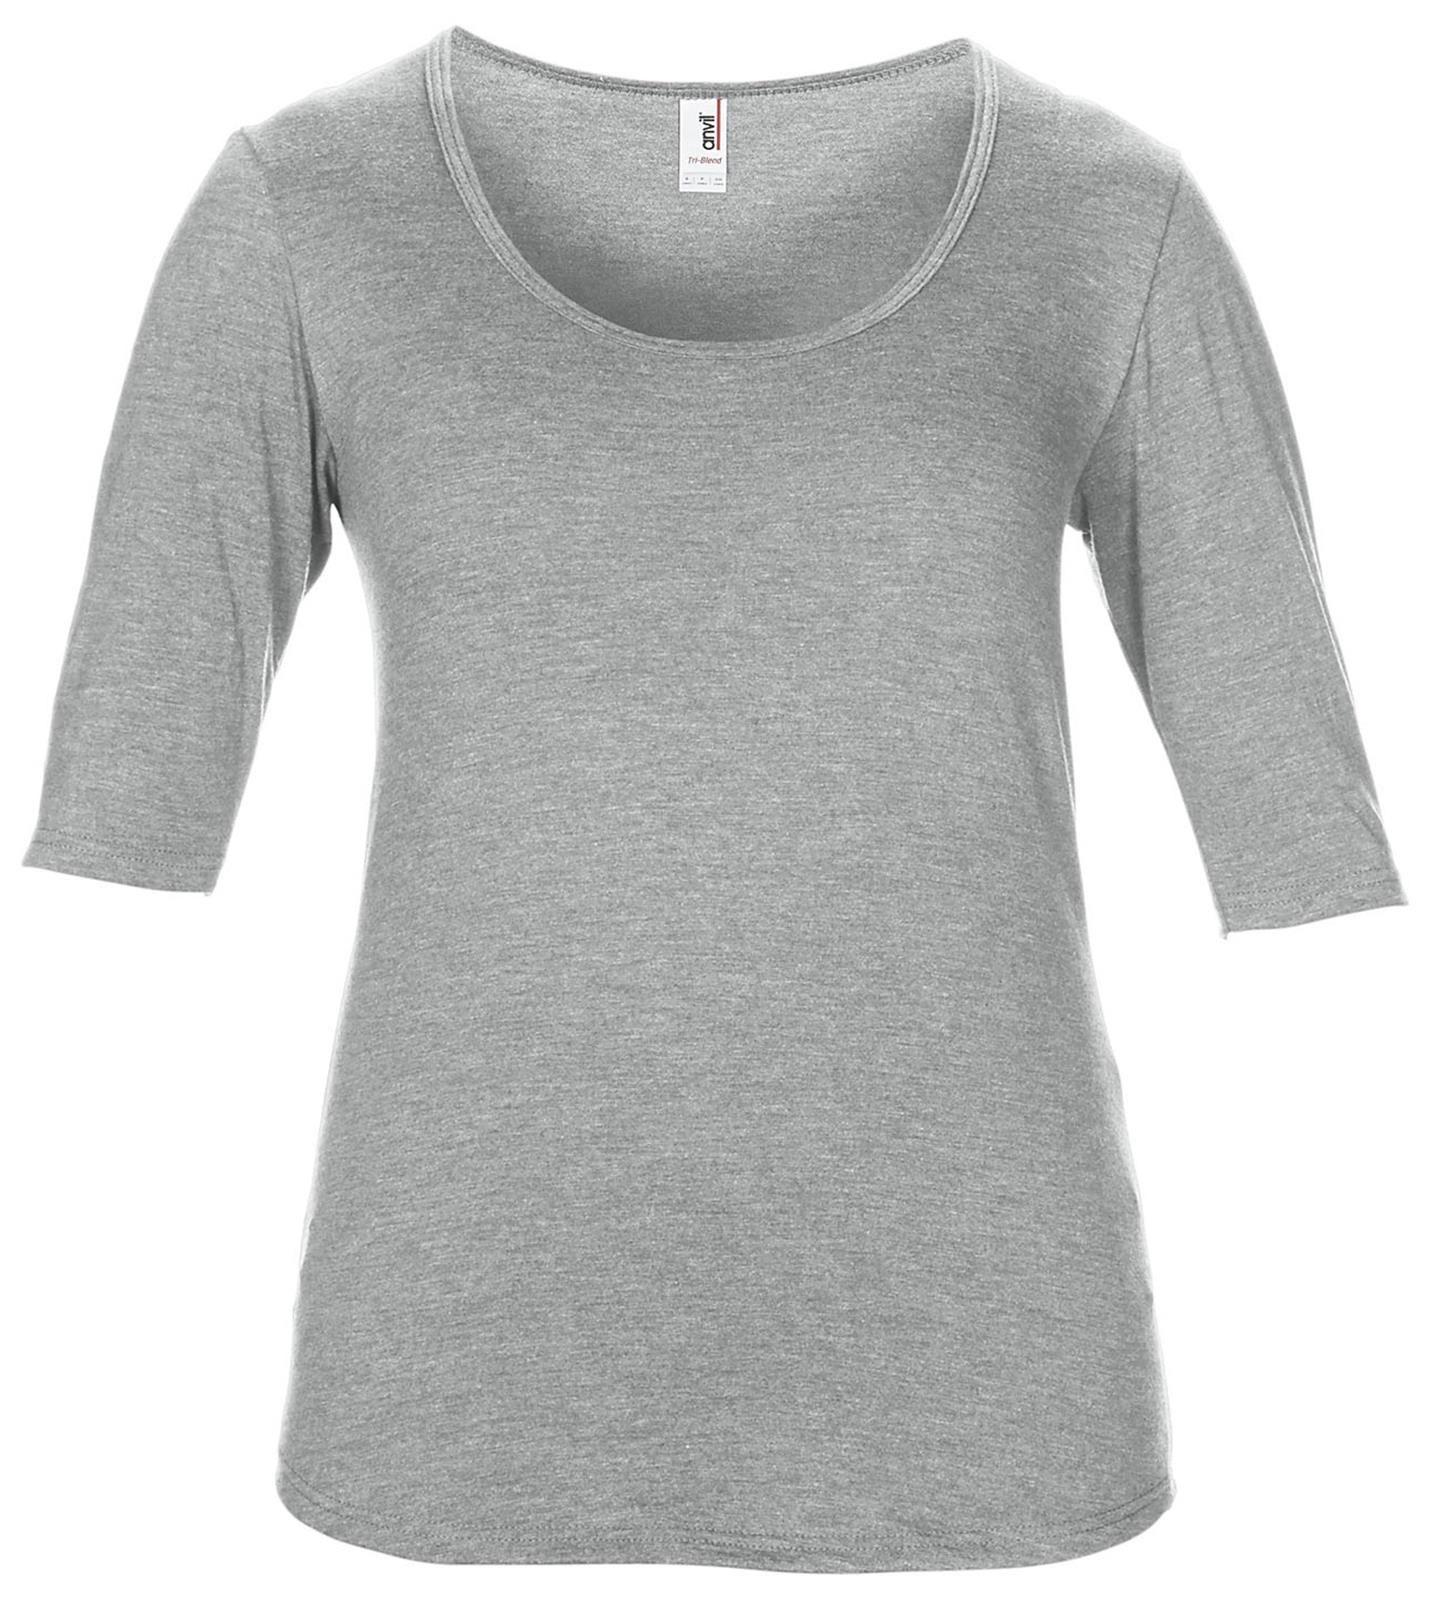 ANVIL Women/'s Tri-Blend Deep Scoop Neck 1//2 Sleeve Tee Casual Blank T-Shirt TOP